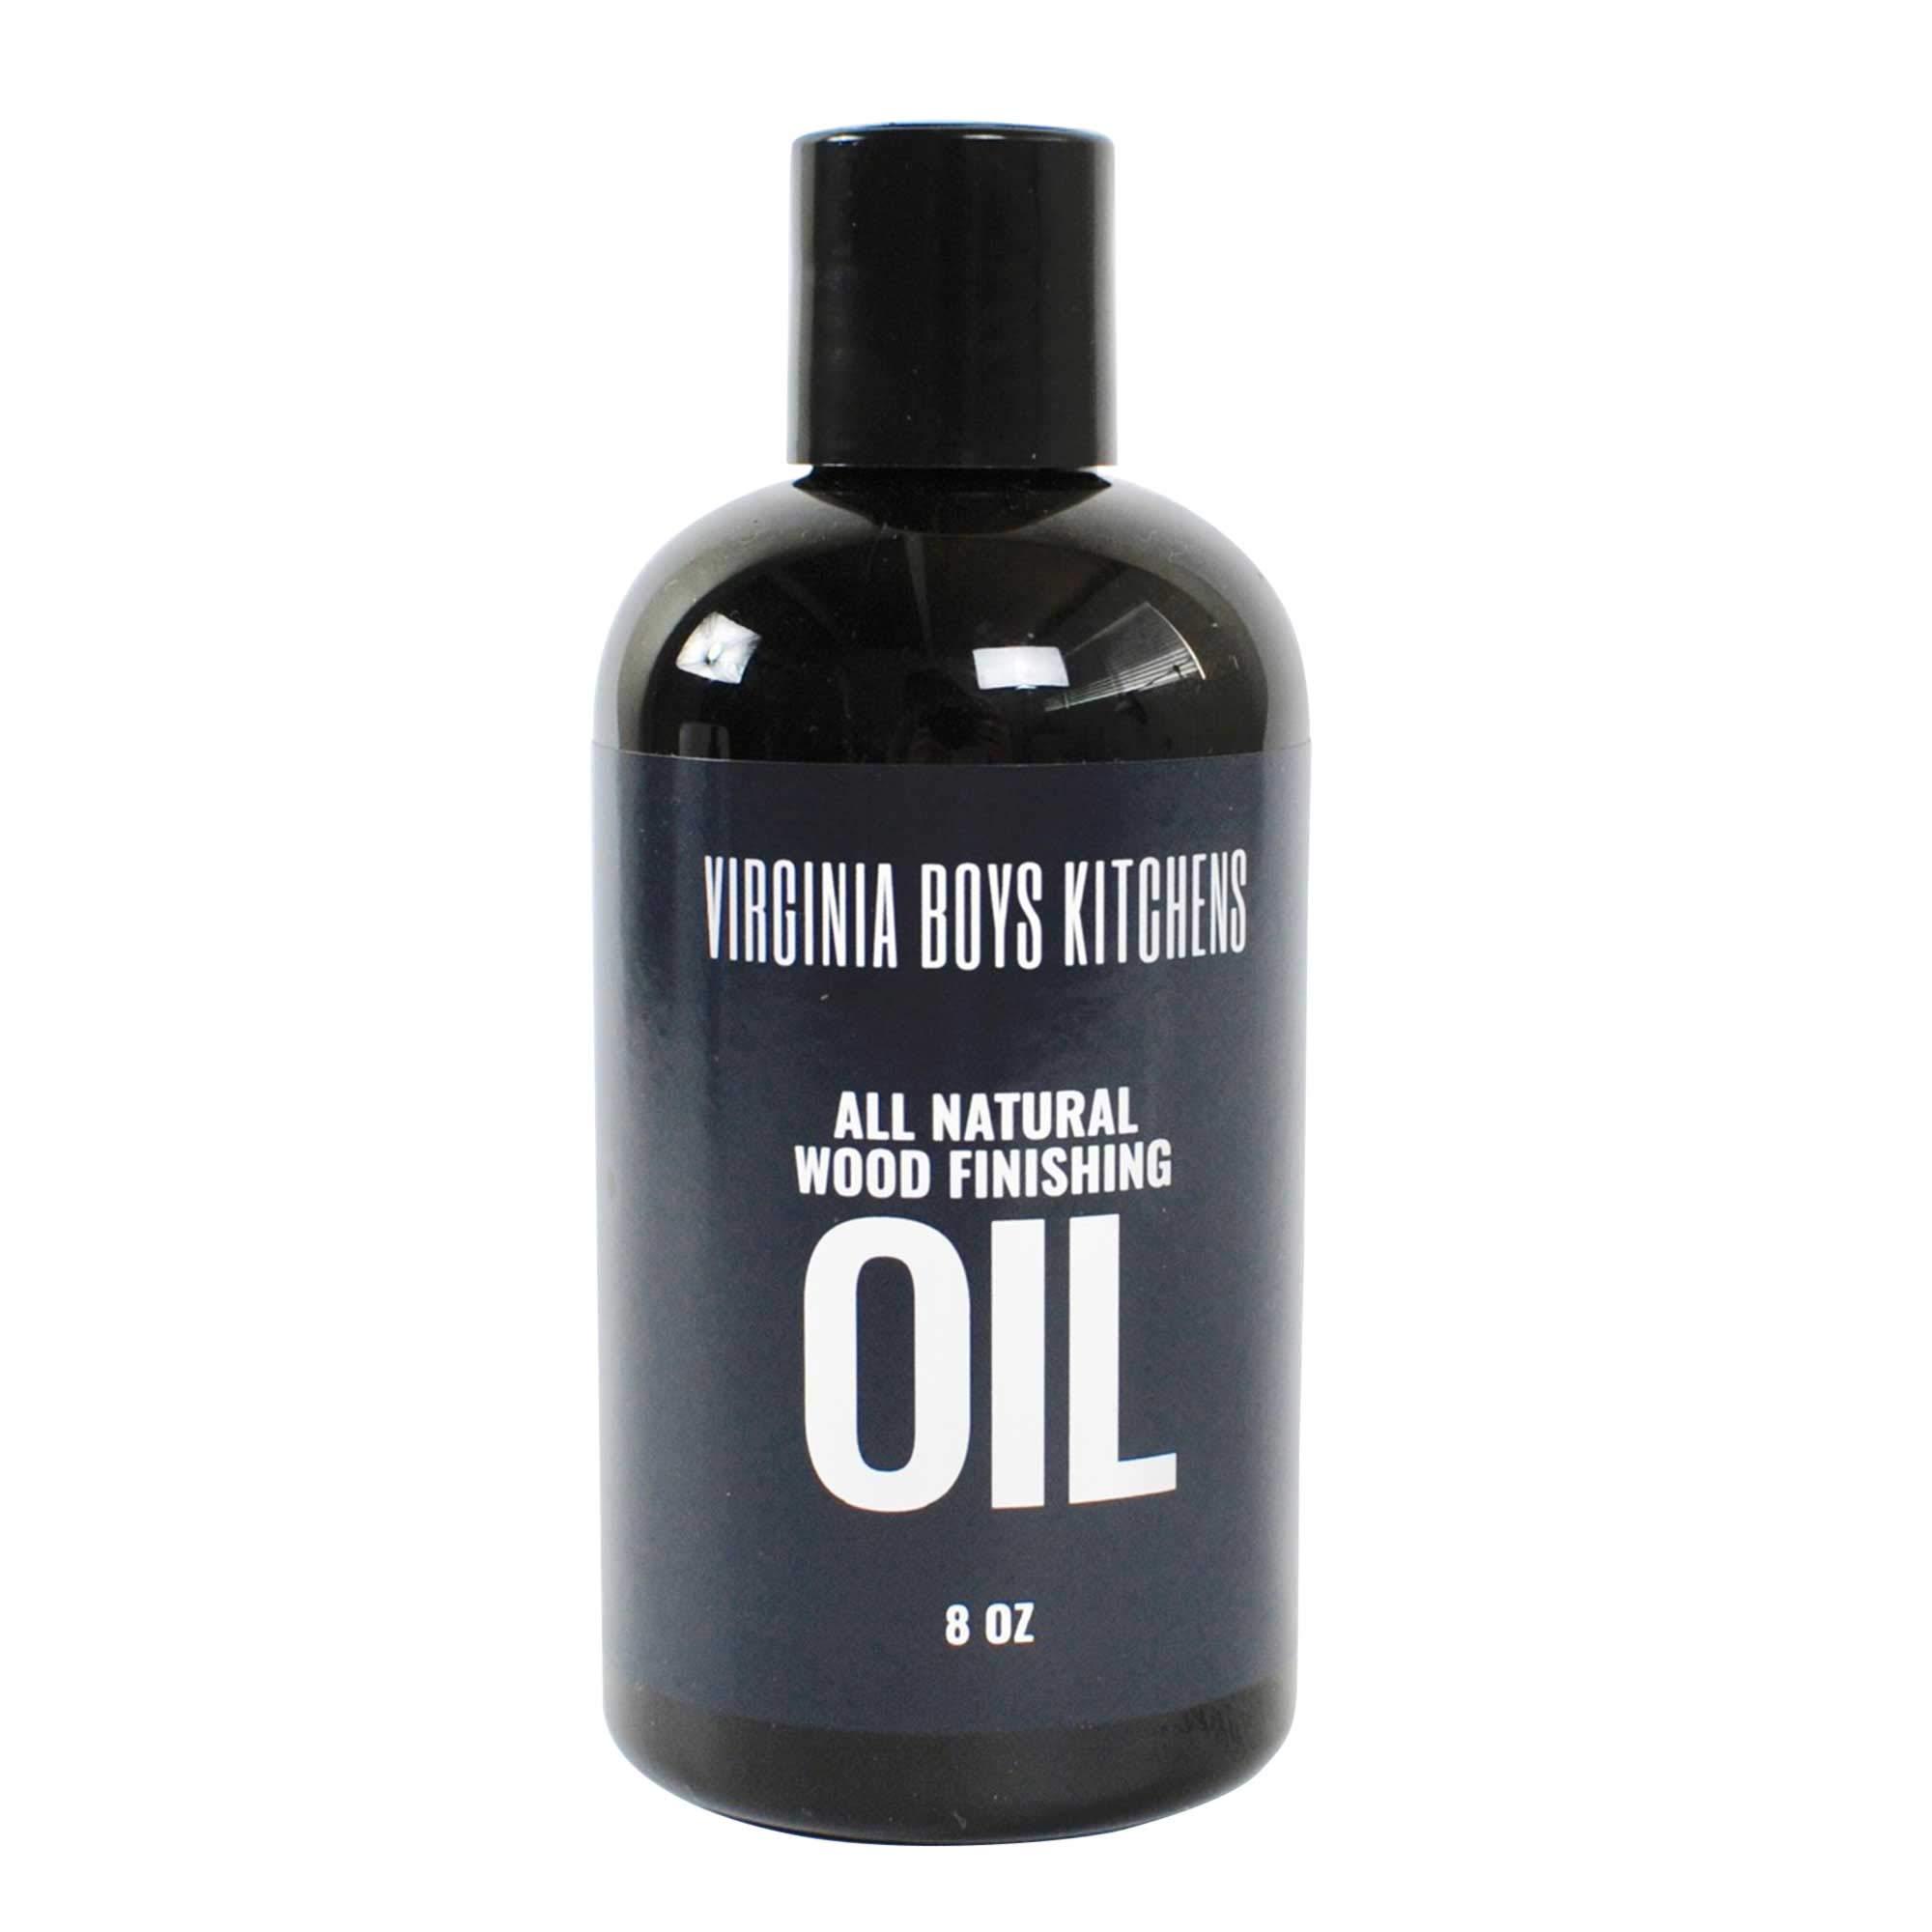 Virginia Boys Kitchens All Natural Wood Seasoning Oil (8 oz Bottle) by Virginia Boys Kitchens